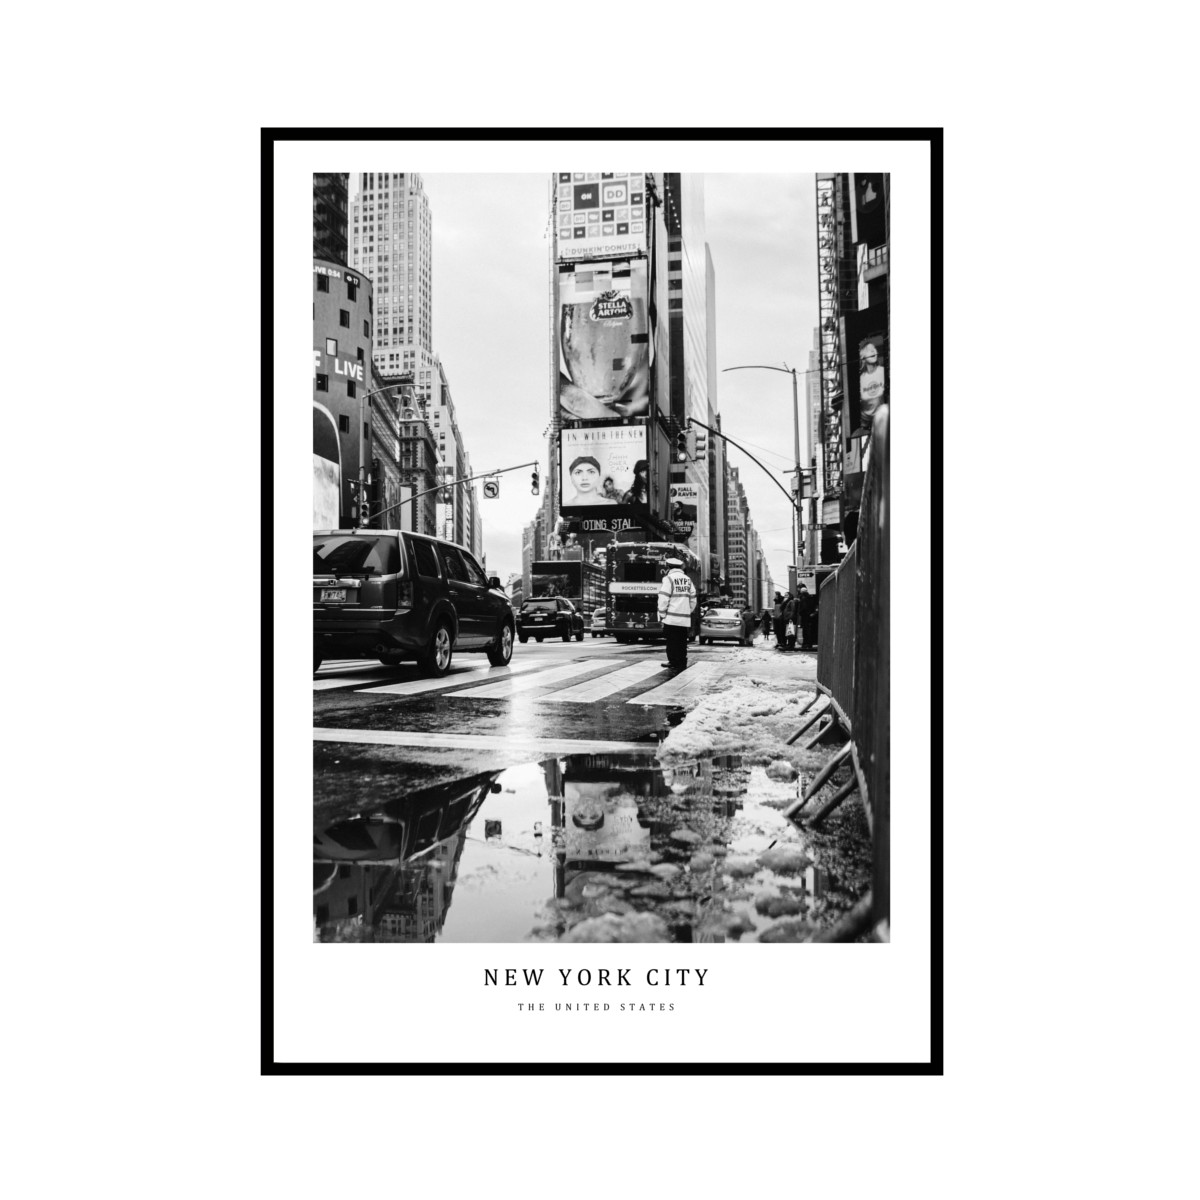 """NEW YORK CITY"" US - POSTER [SD-000592] A4サイズ ポスター単品"